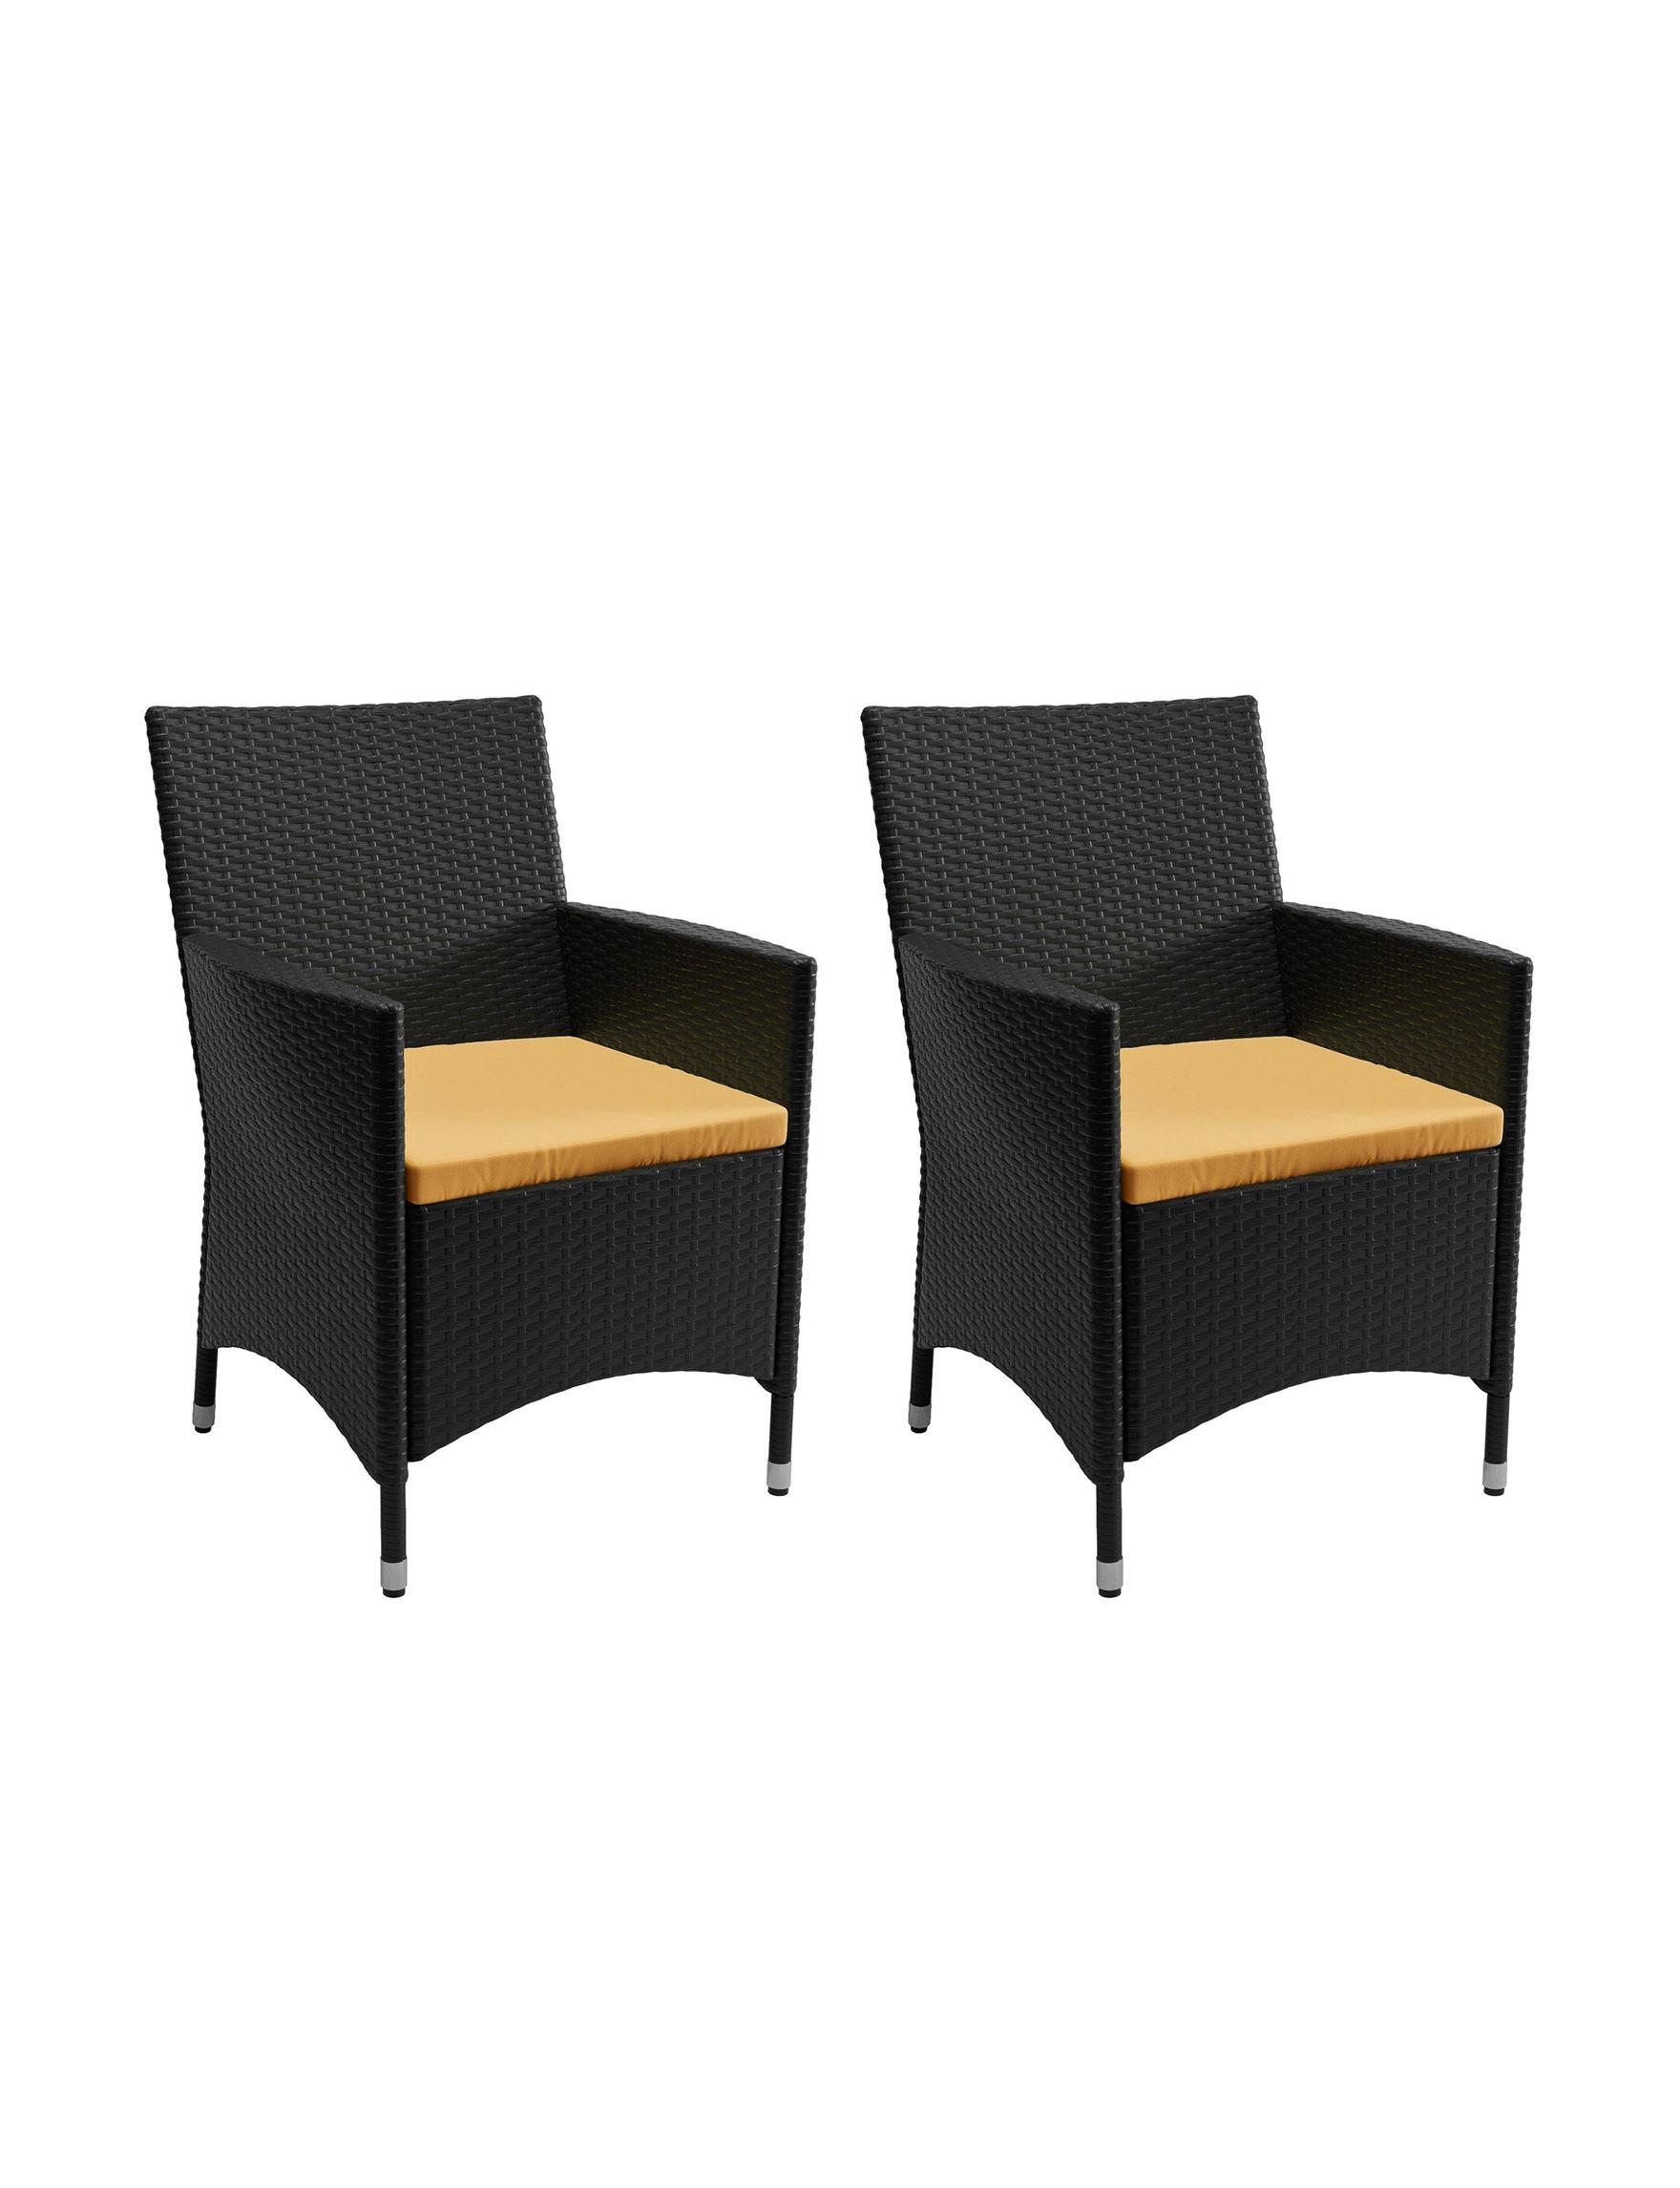 Corliving  Patio & Outdoor Furniture